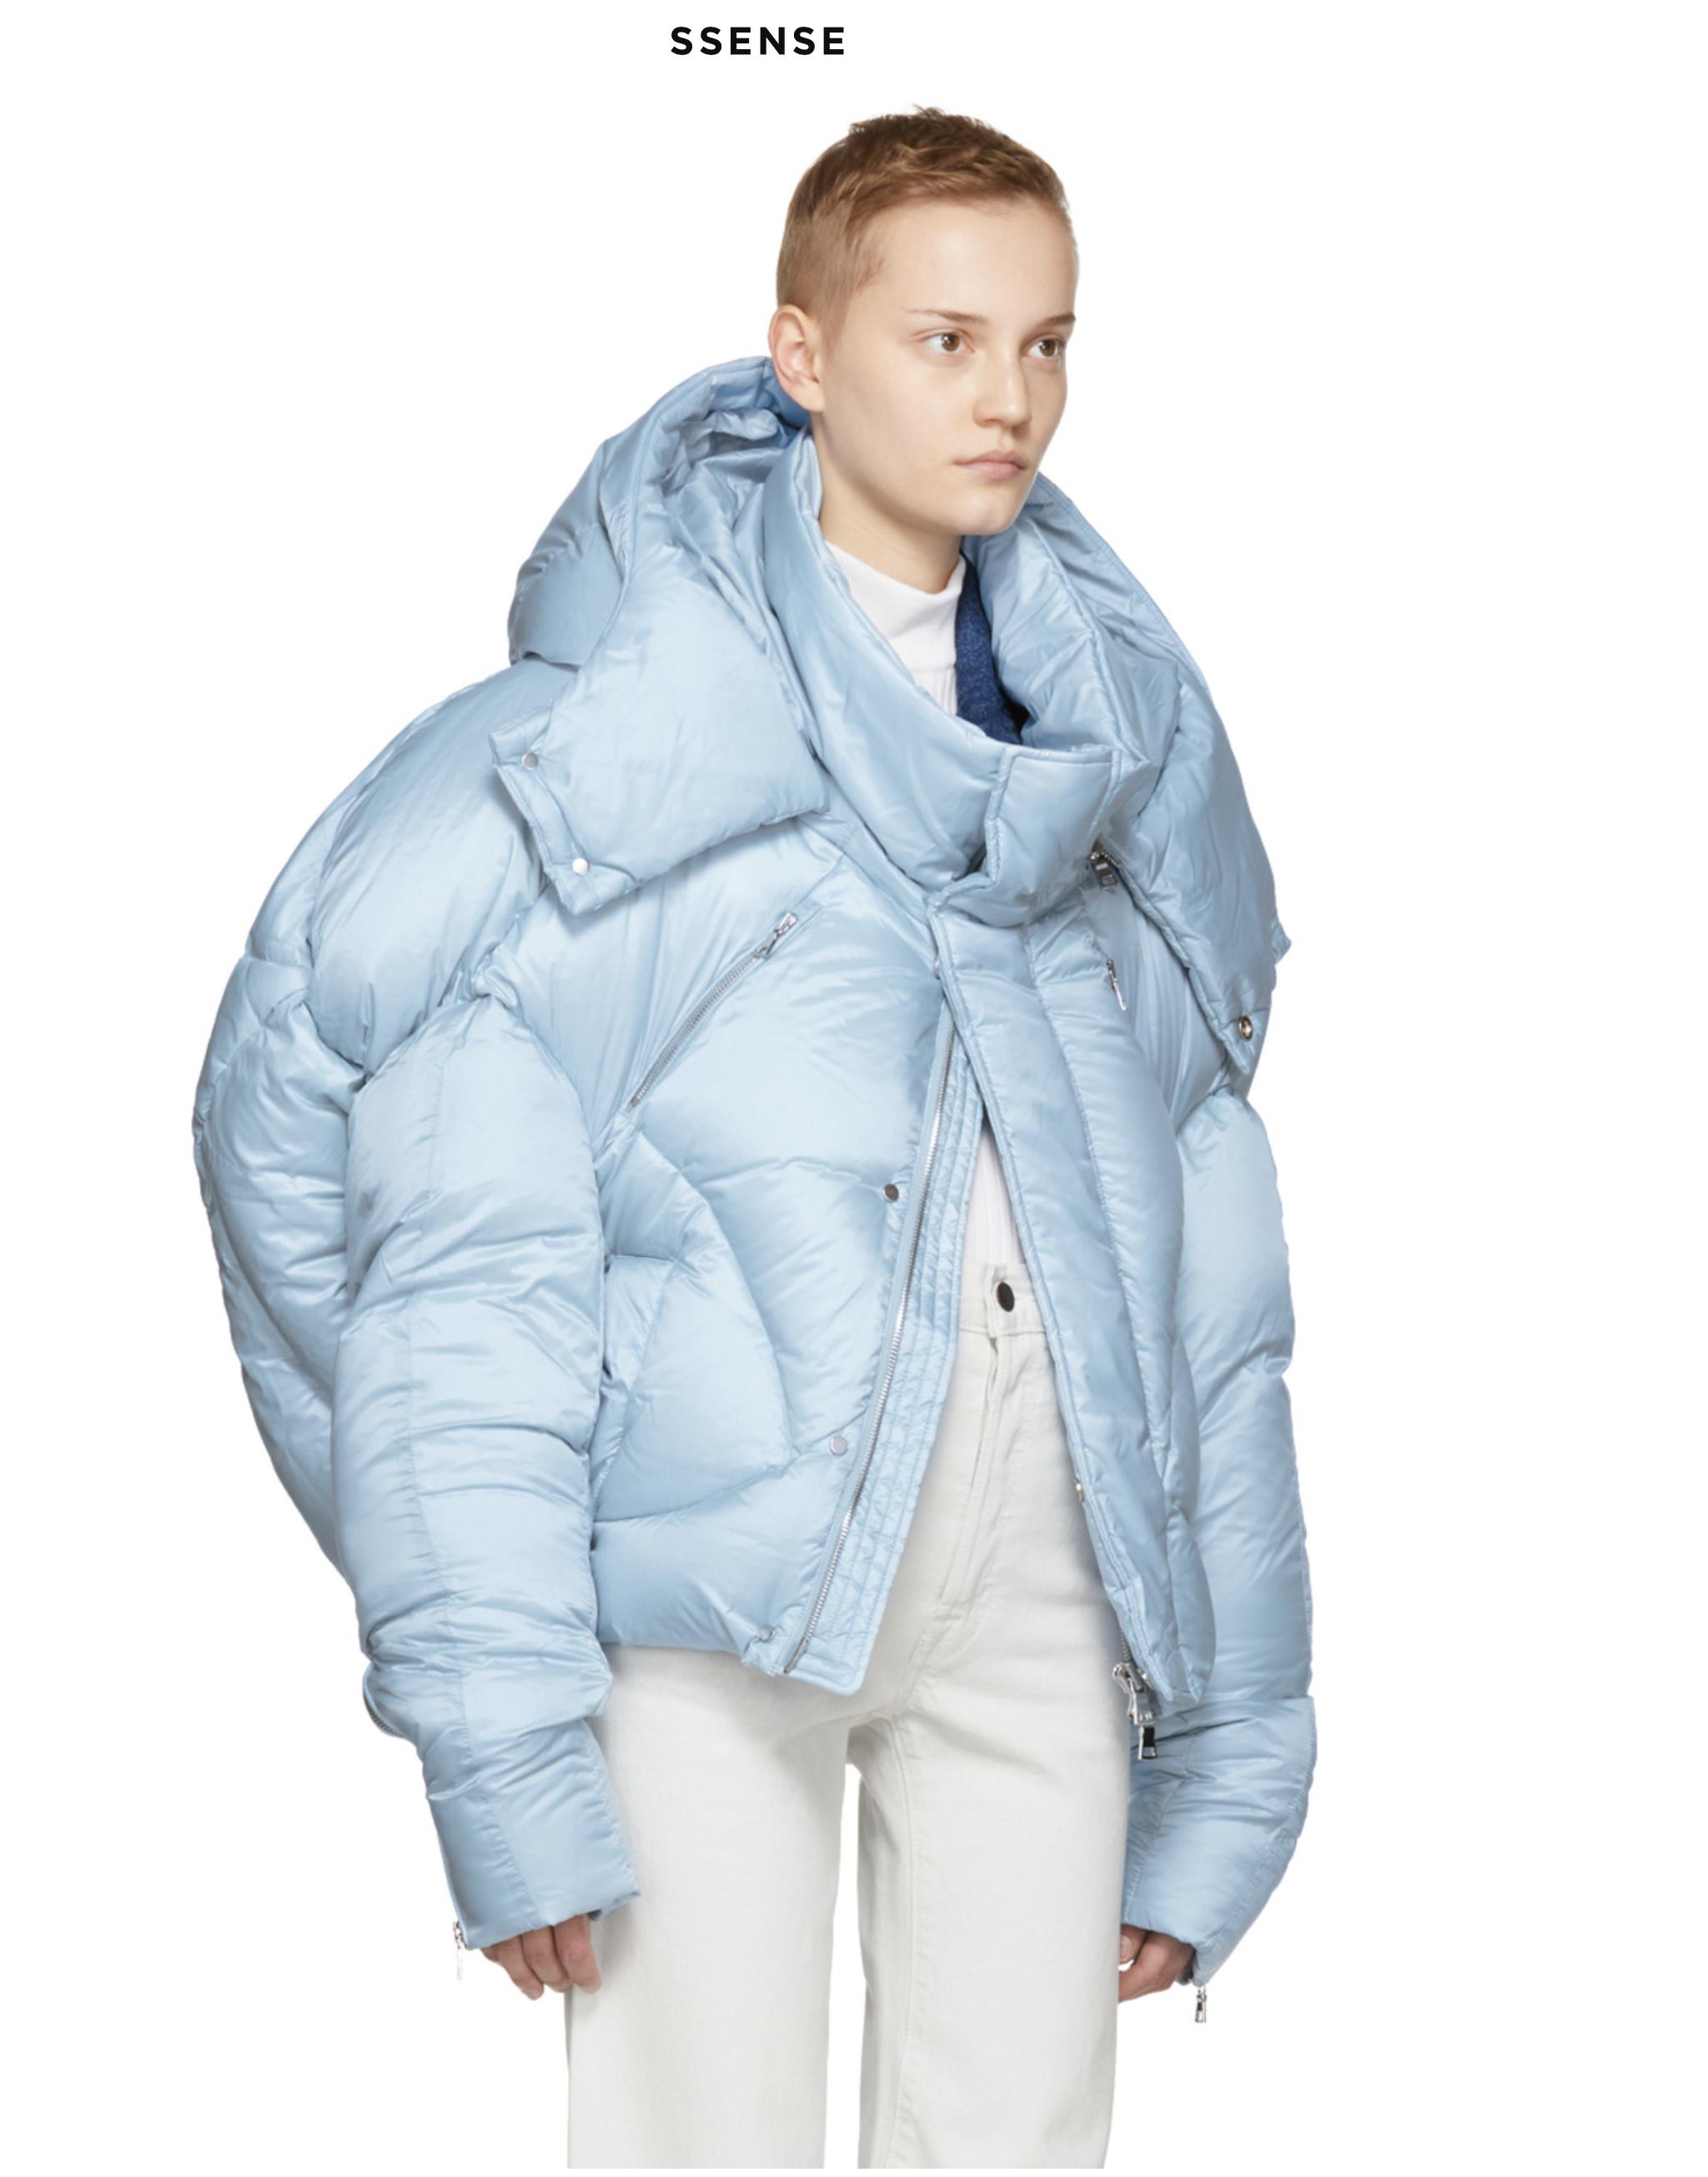 CHENPENG 17AW Baby Blue Puffer Jacket 25ac36b55